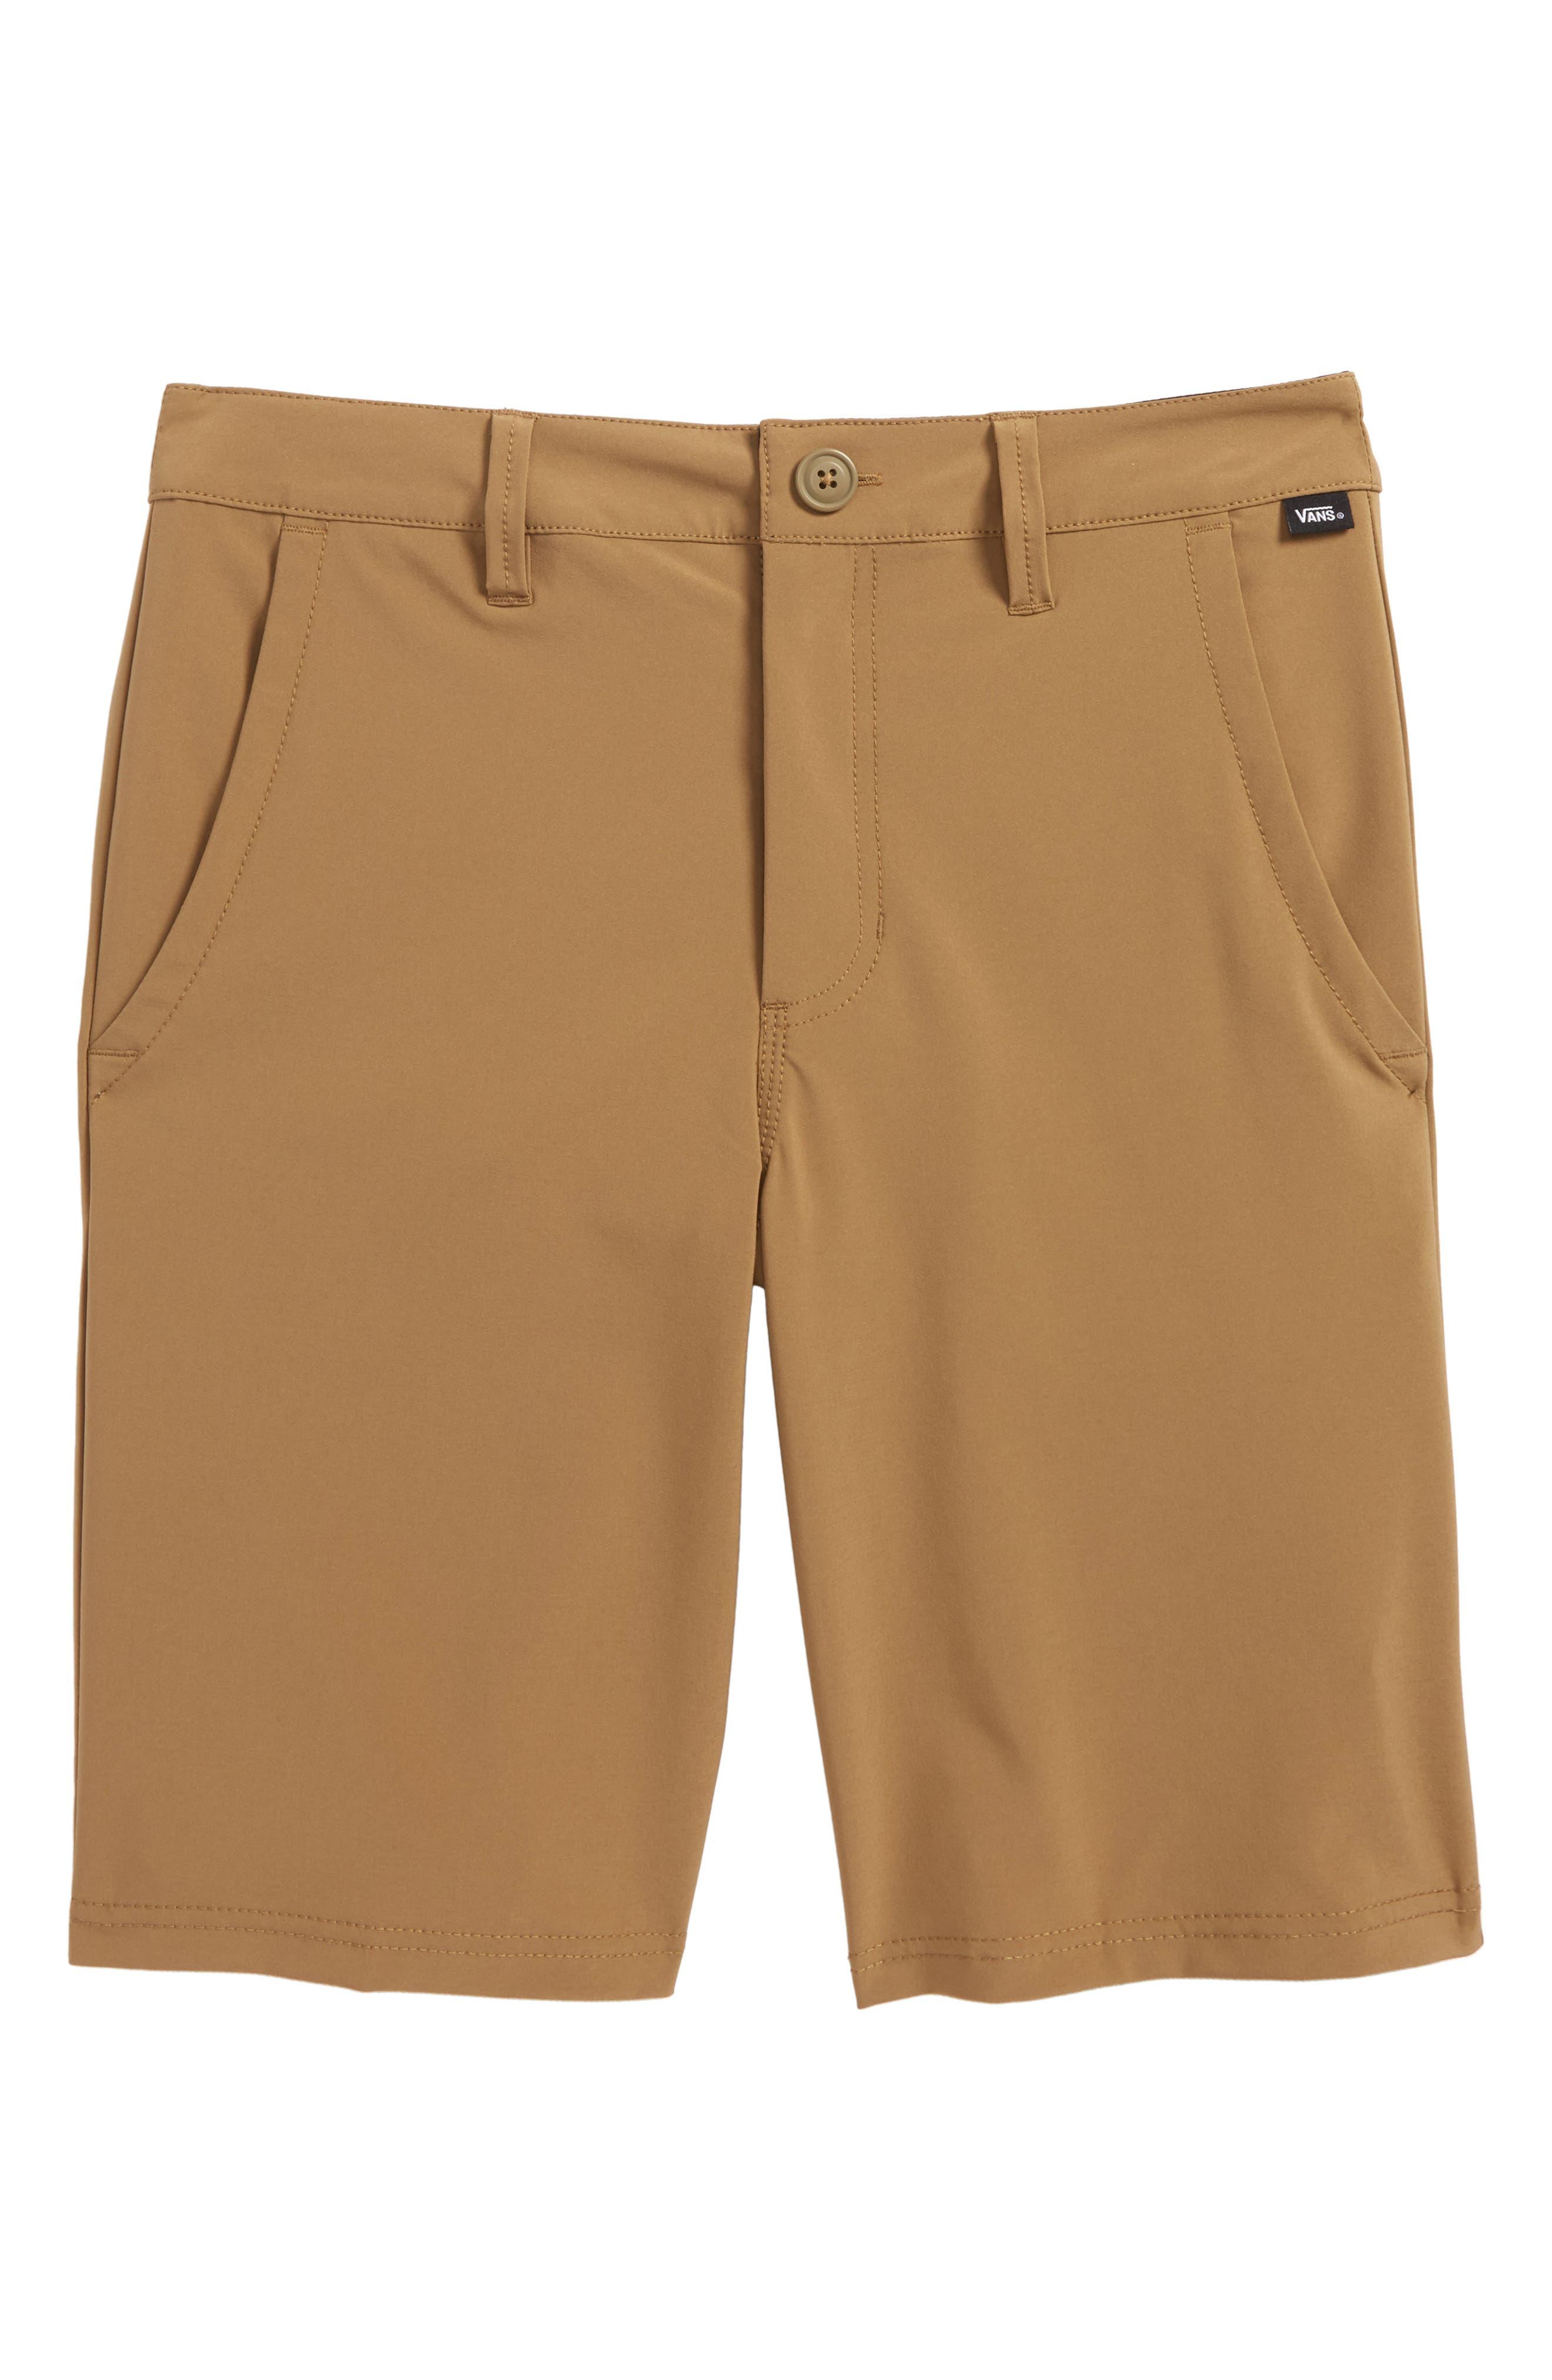 Authentic Decksider Hybrid Shorts,                         Main,                         color, Dirt